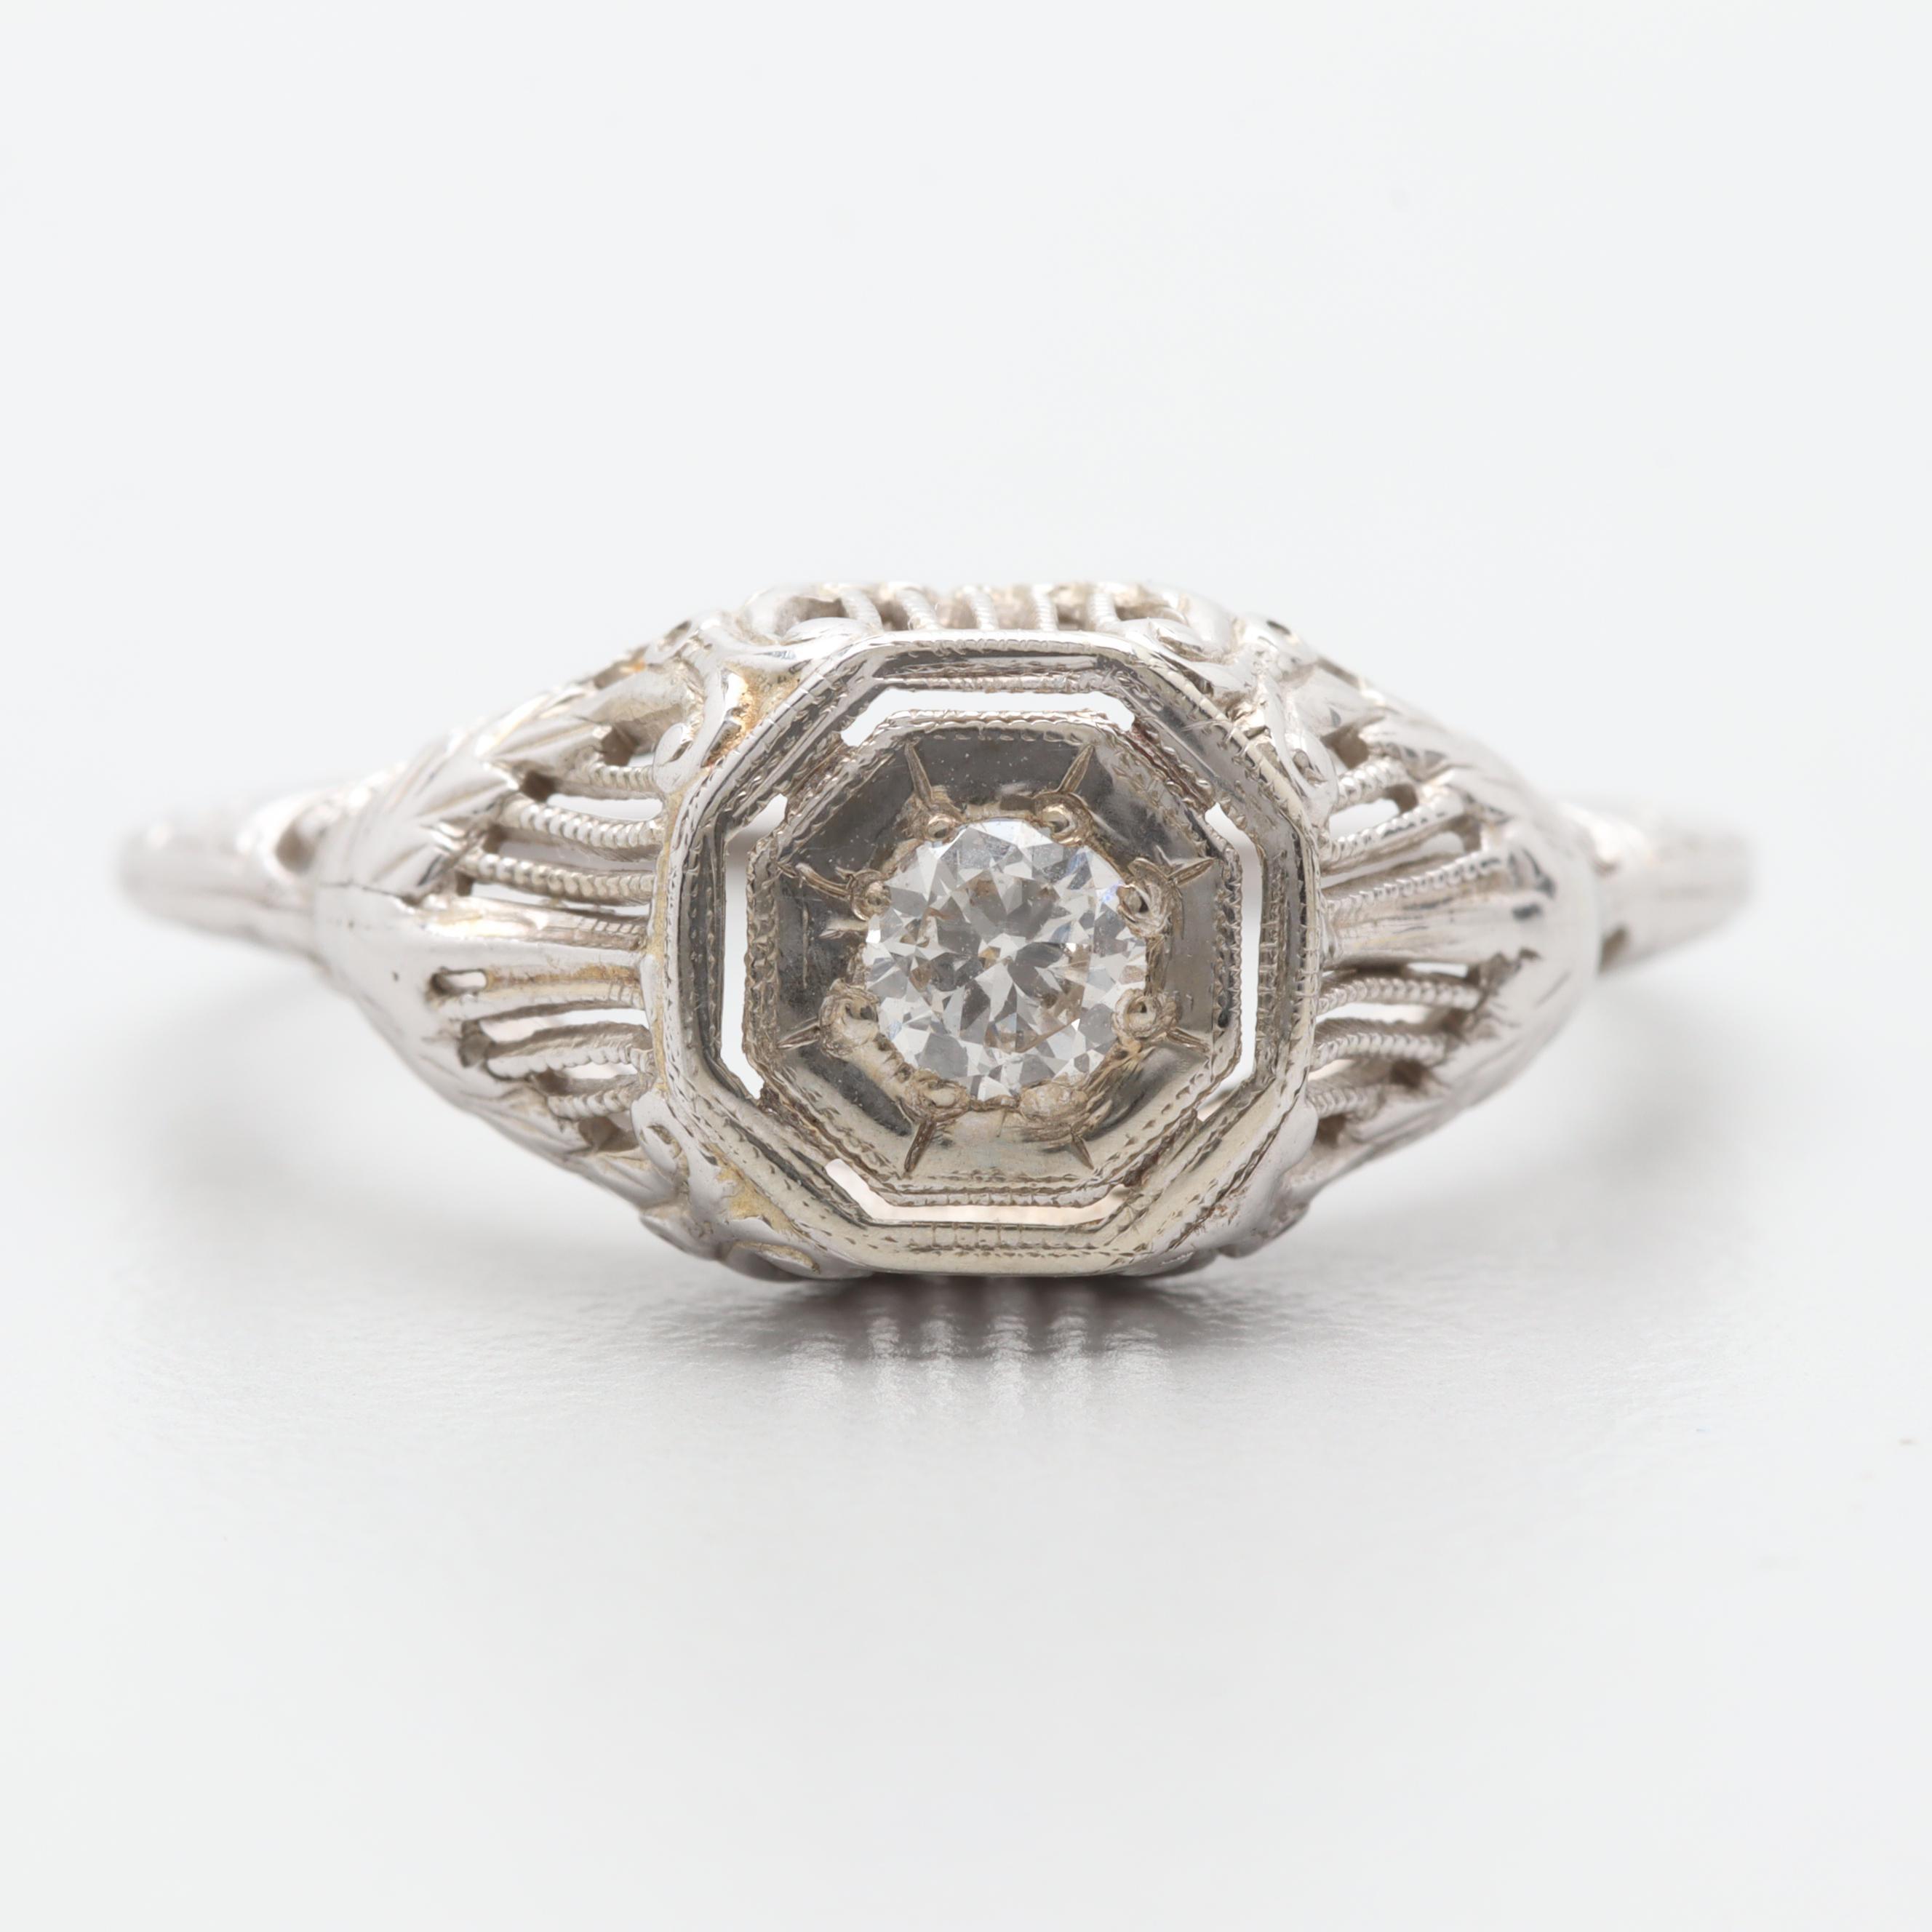 Art Deco 18K White Gold Diamond Solitaire Ring